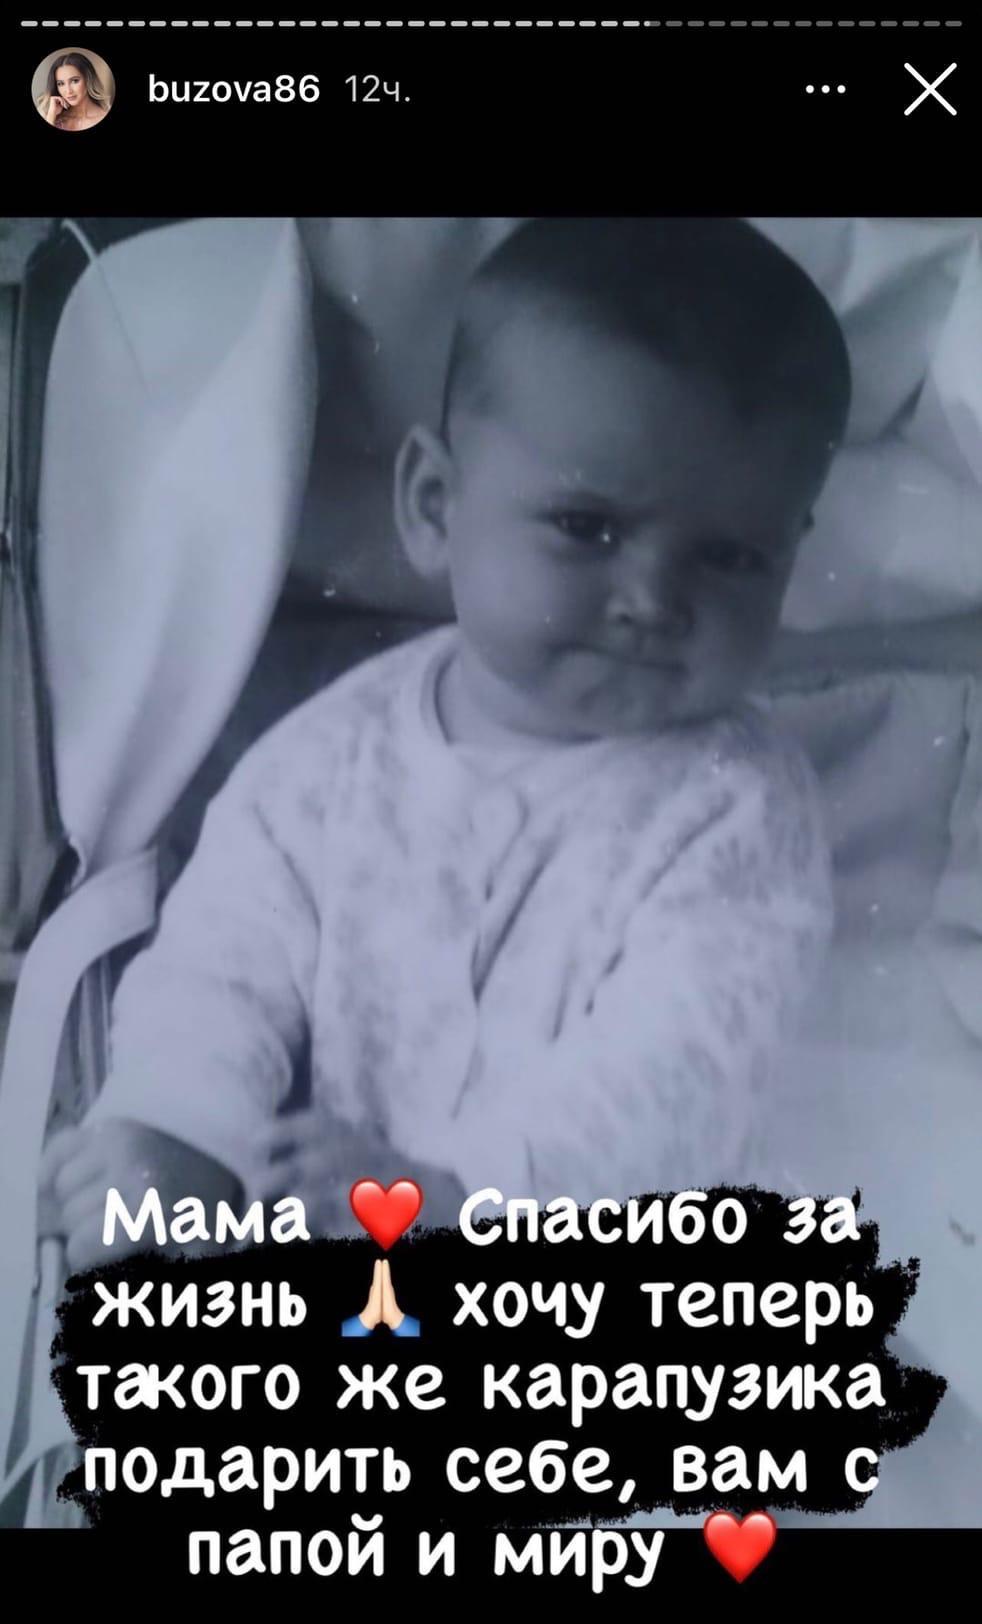 """Хочу карапузика"": Ольга Бузова снова намекнула на беременность"